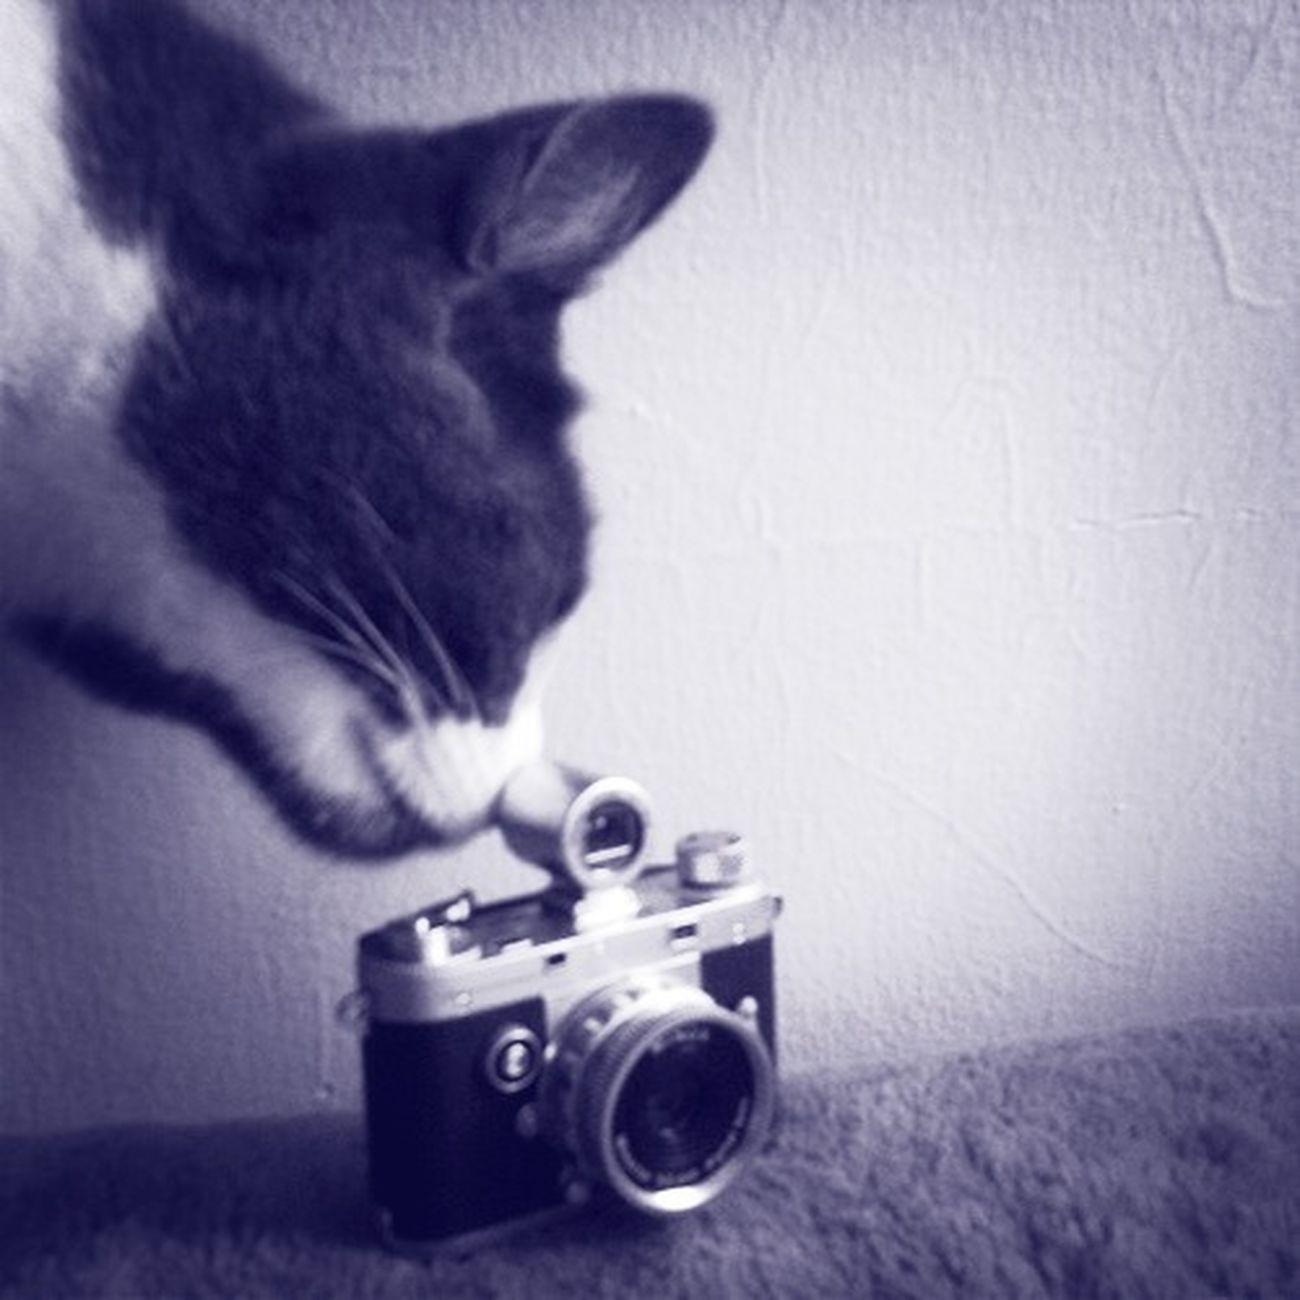 I Spy A Camera